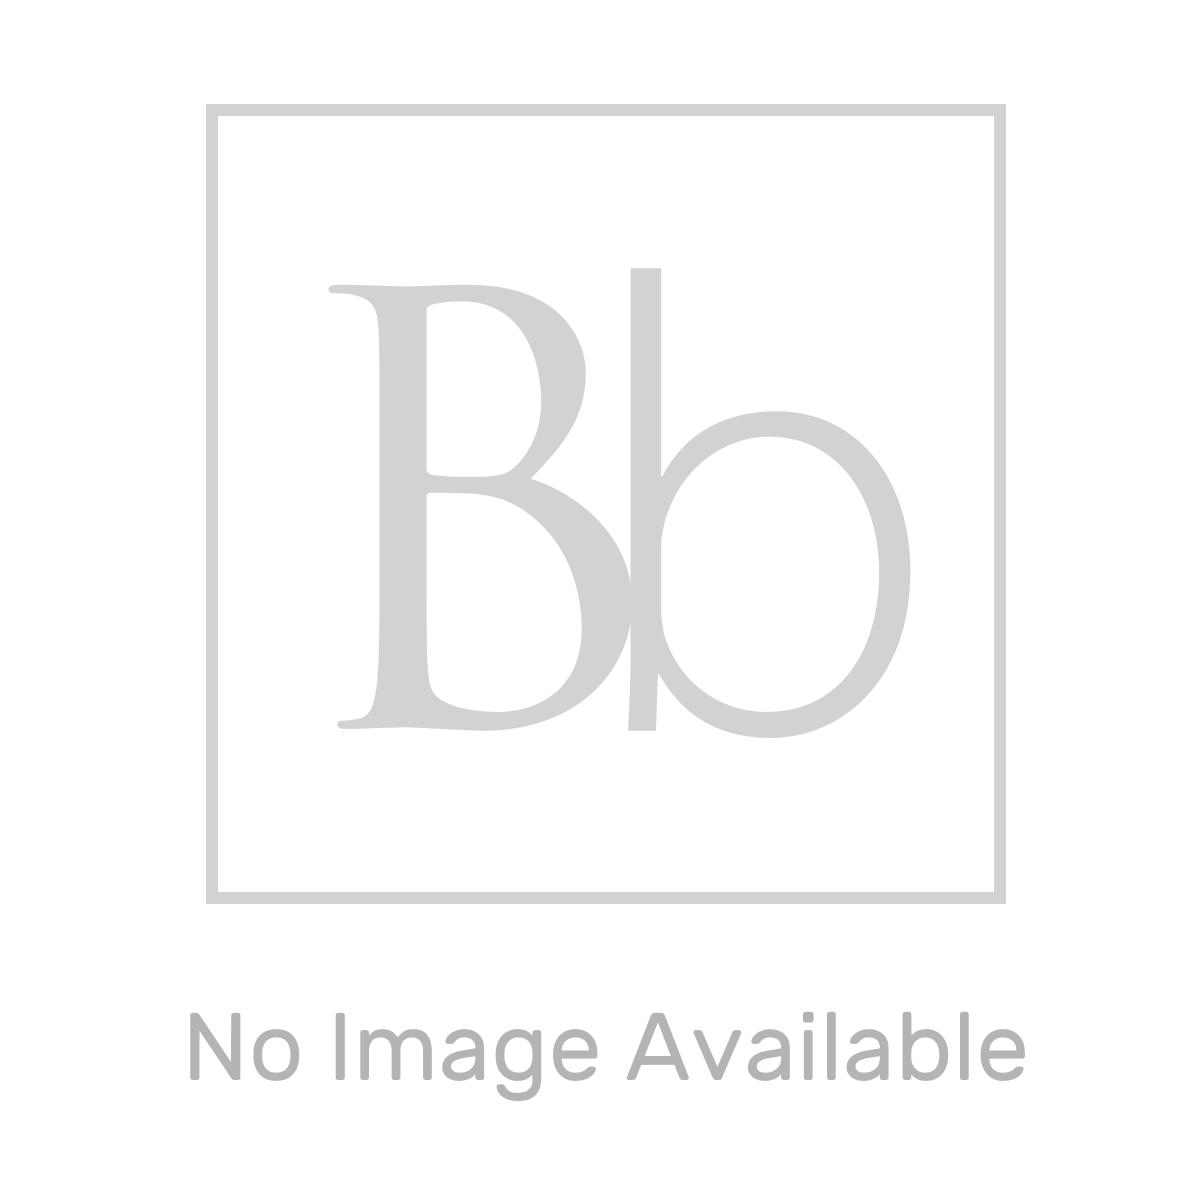 April Rectangular Anti Slip Shower Tray 1500 x 900 Line Drawing